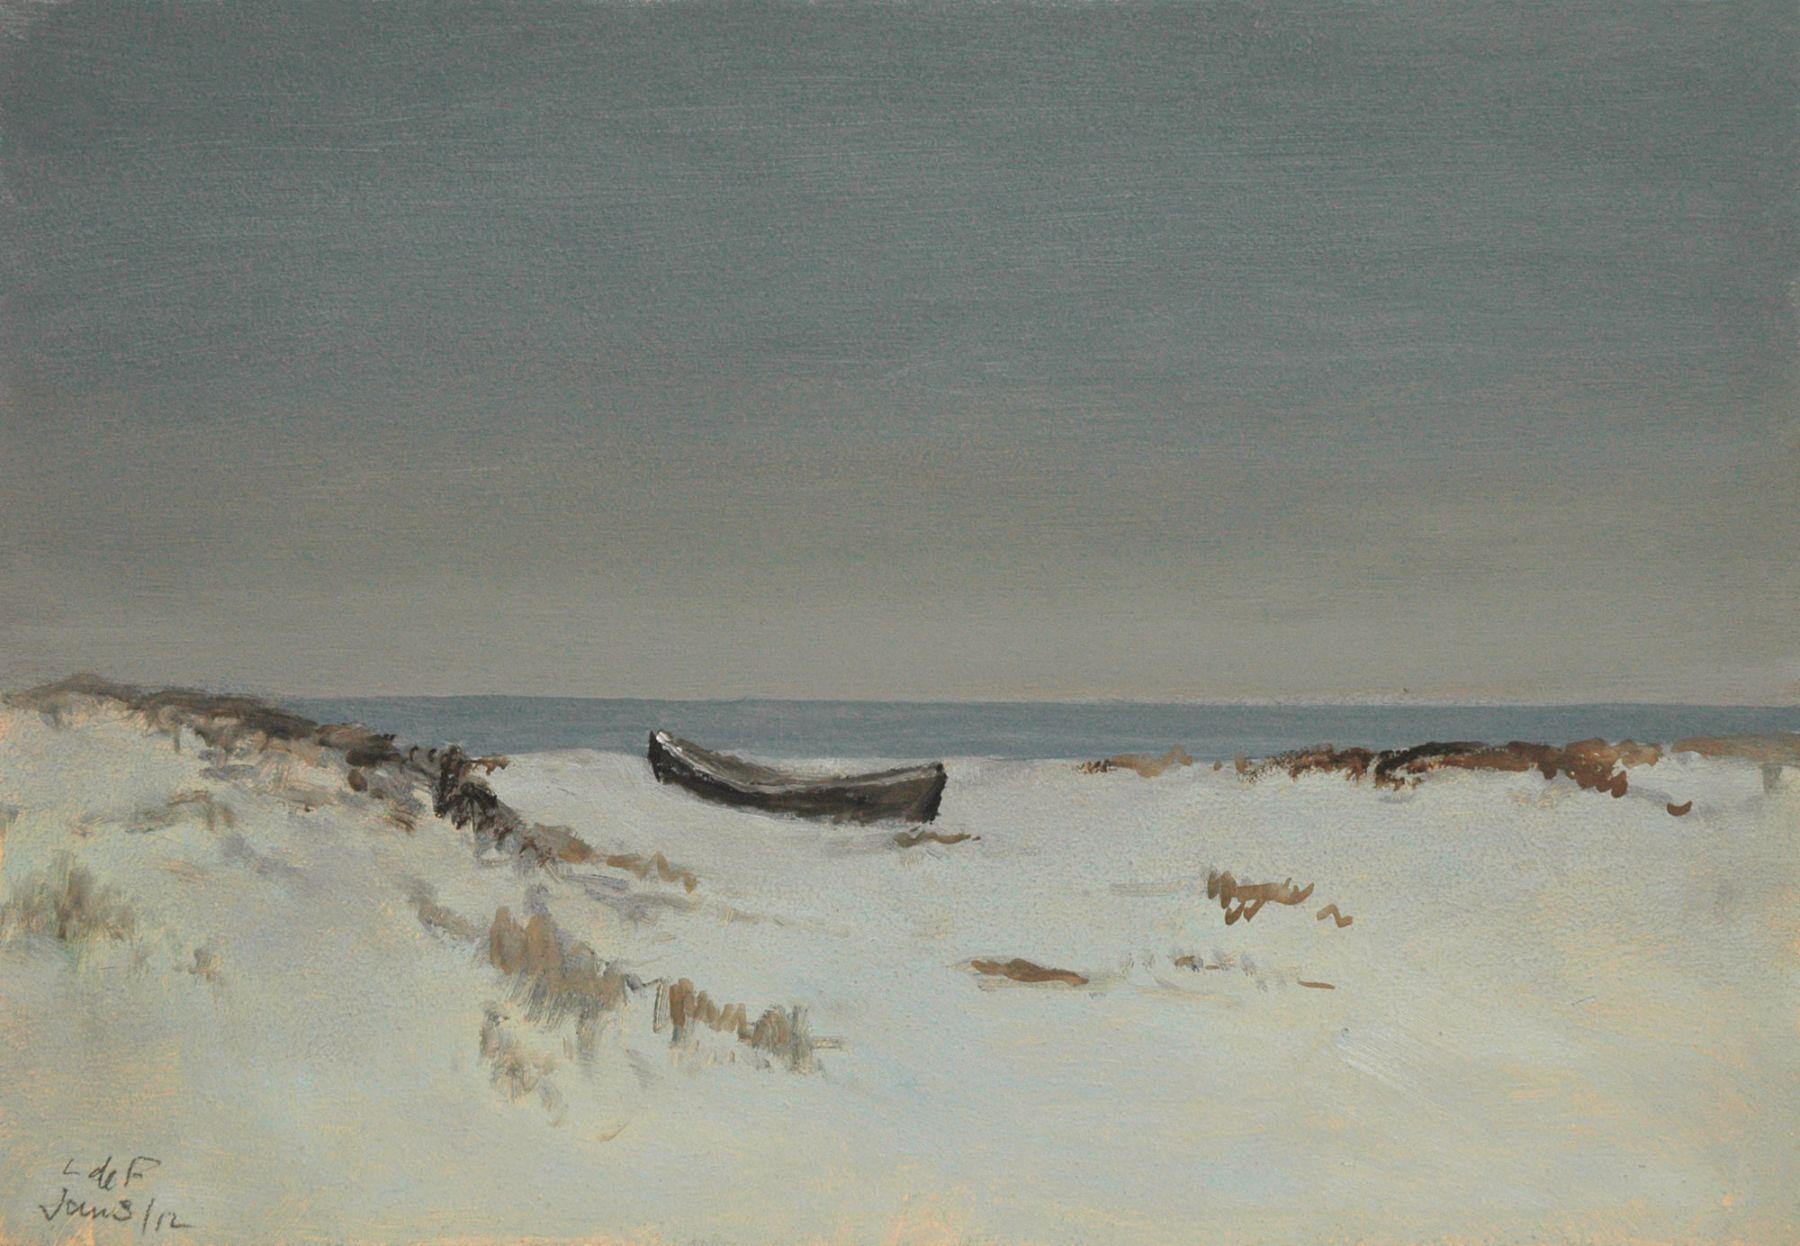 LOCKWOOD DE FOREST (1850-1932), Moonlight Over Dunes, Dory Pulled Ashore, Jan. 3, 1912